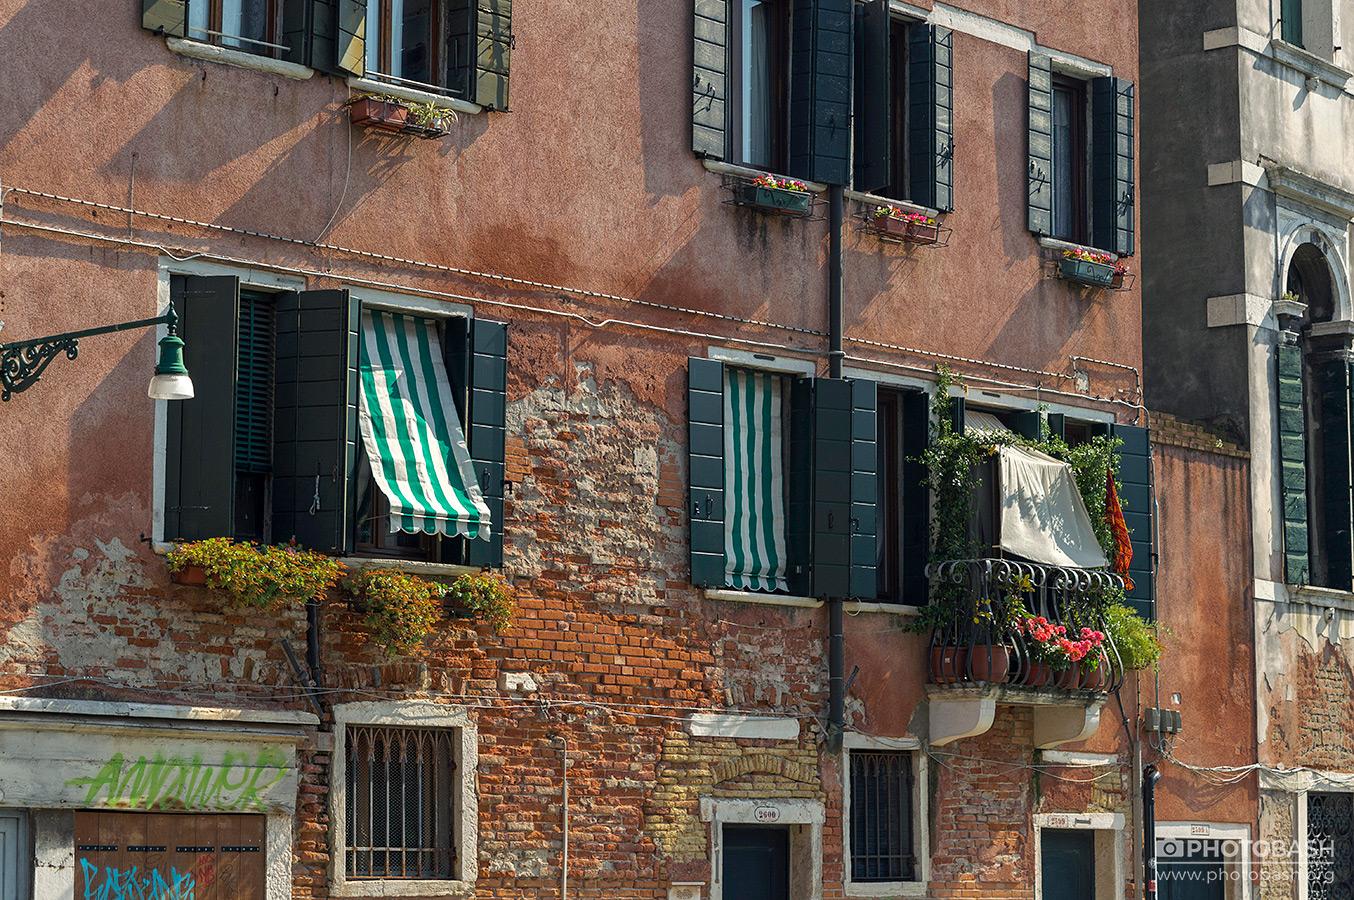 Venice-Canals-Window-Awning.jpg